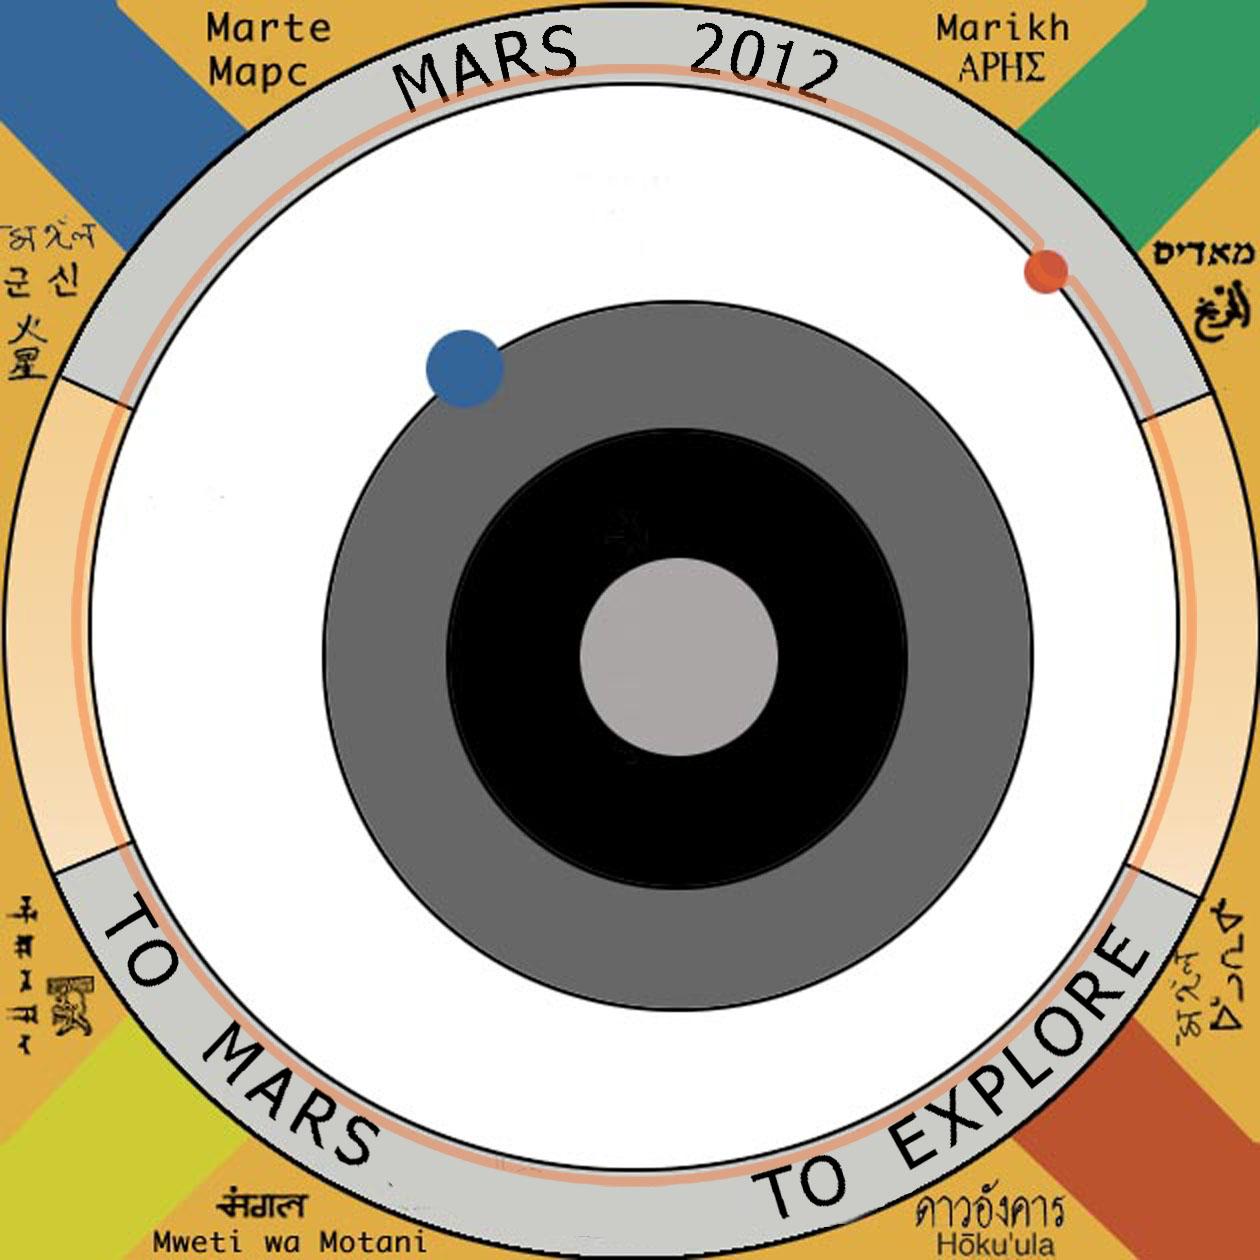 mars rover ultimo mensaje - photo #34